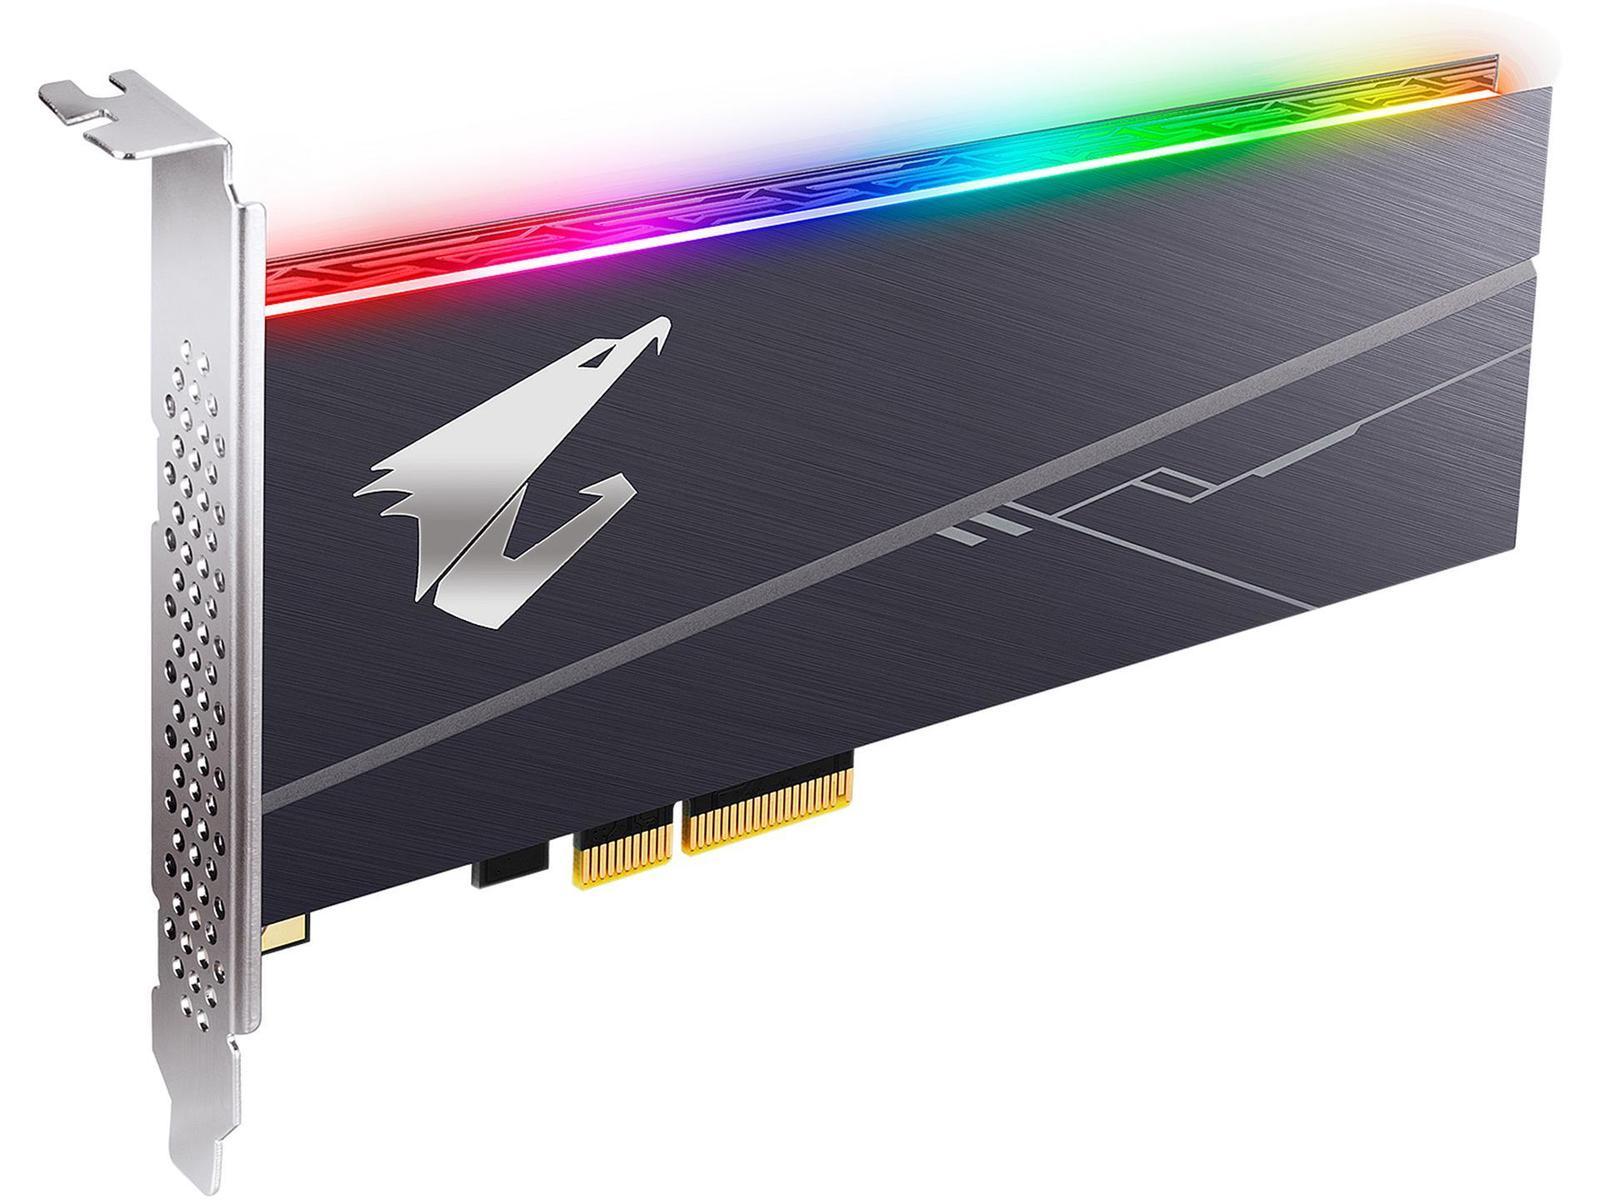 Gigabyte AORUS 1 TB PCI-E NVME Solid State Drive